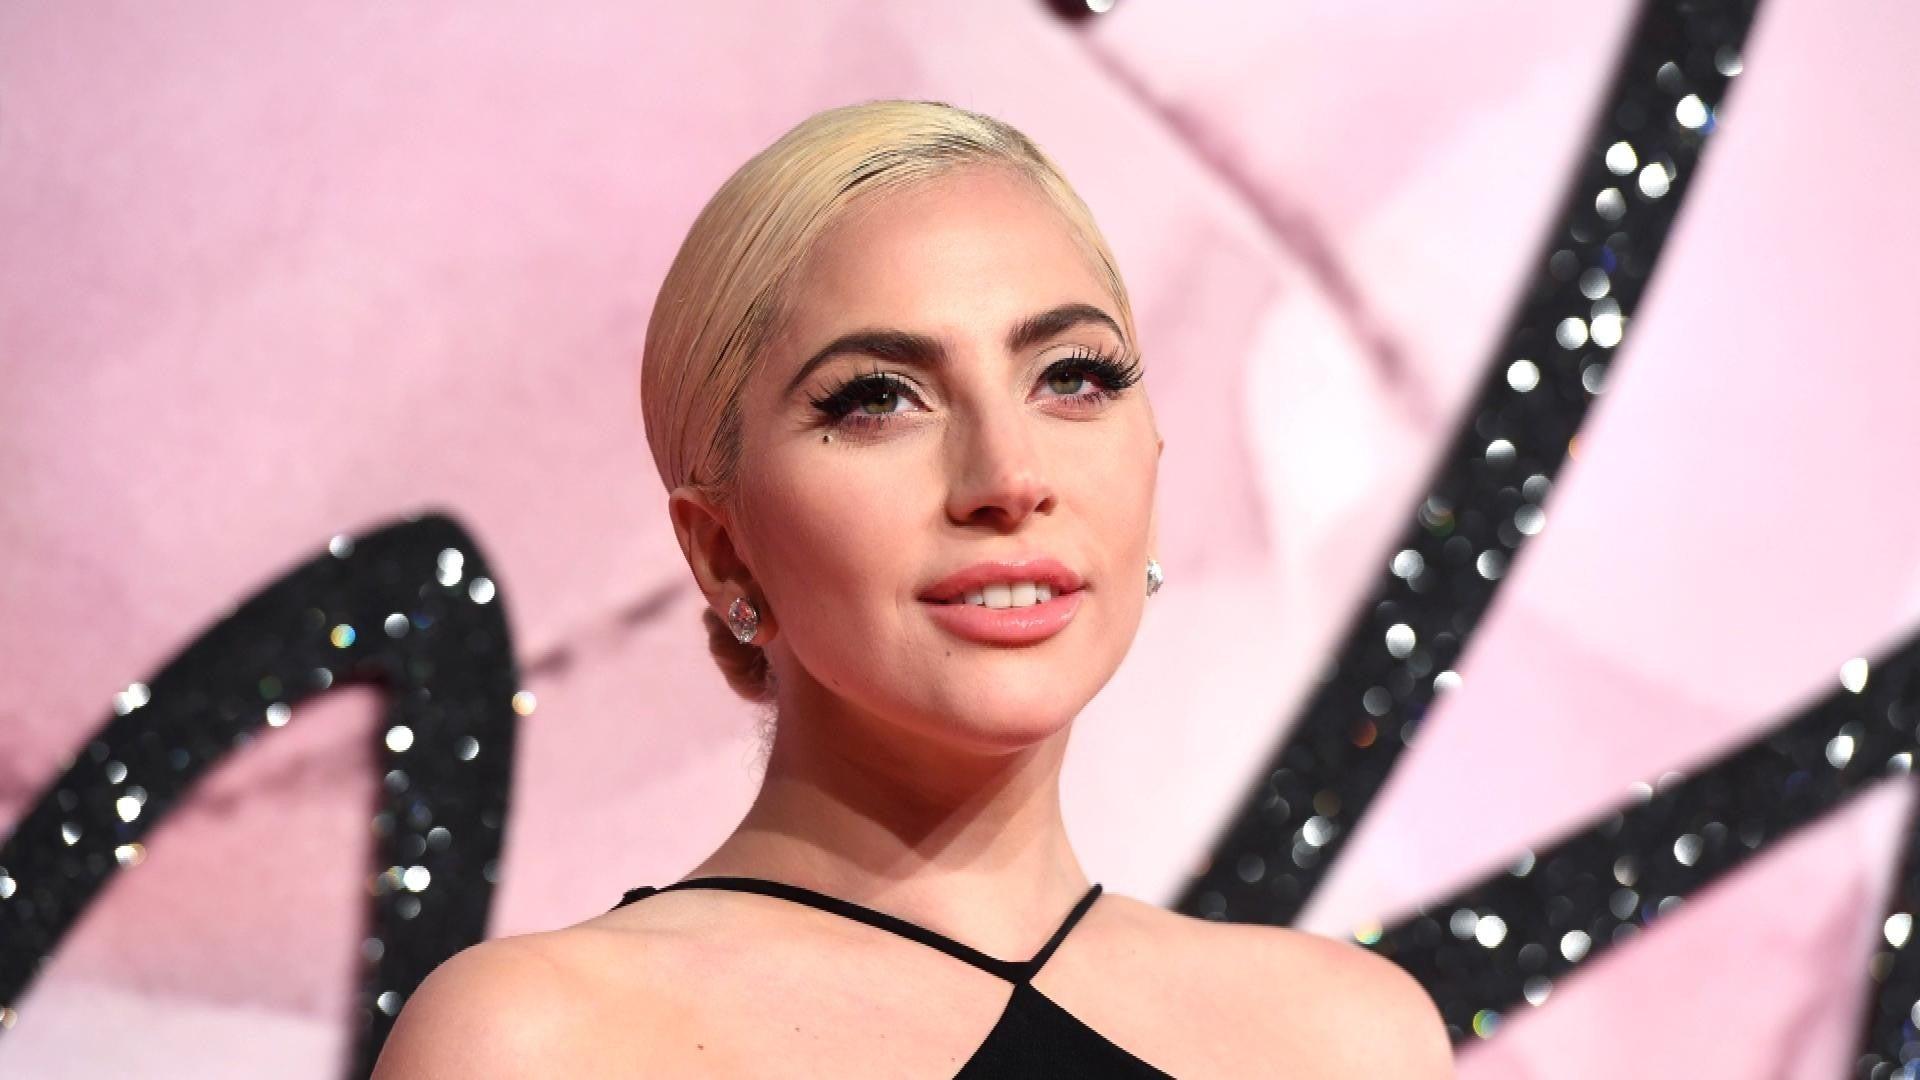 Lady Gaga Goes Nude For Futuristic Photo Shoot See The Pic